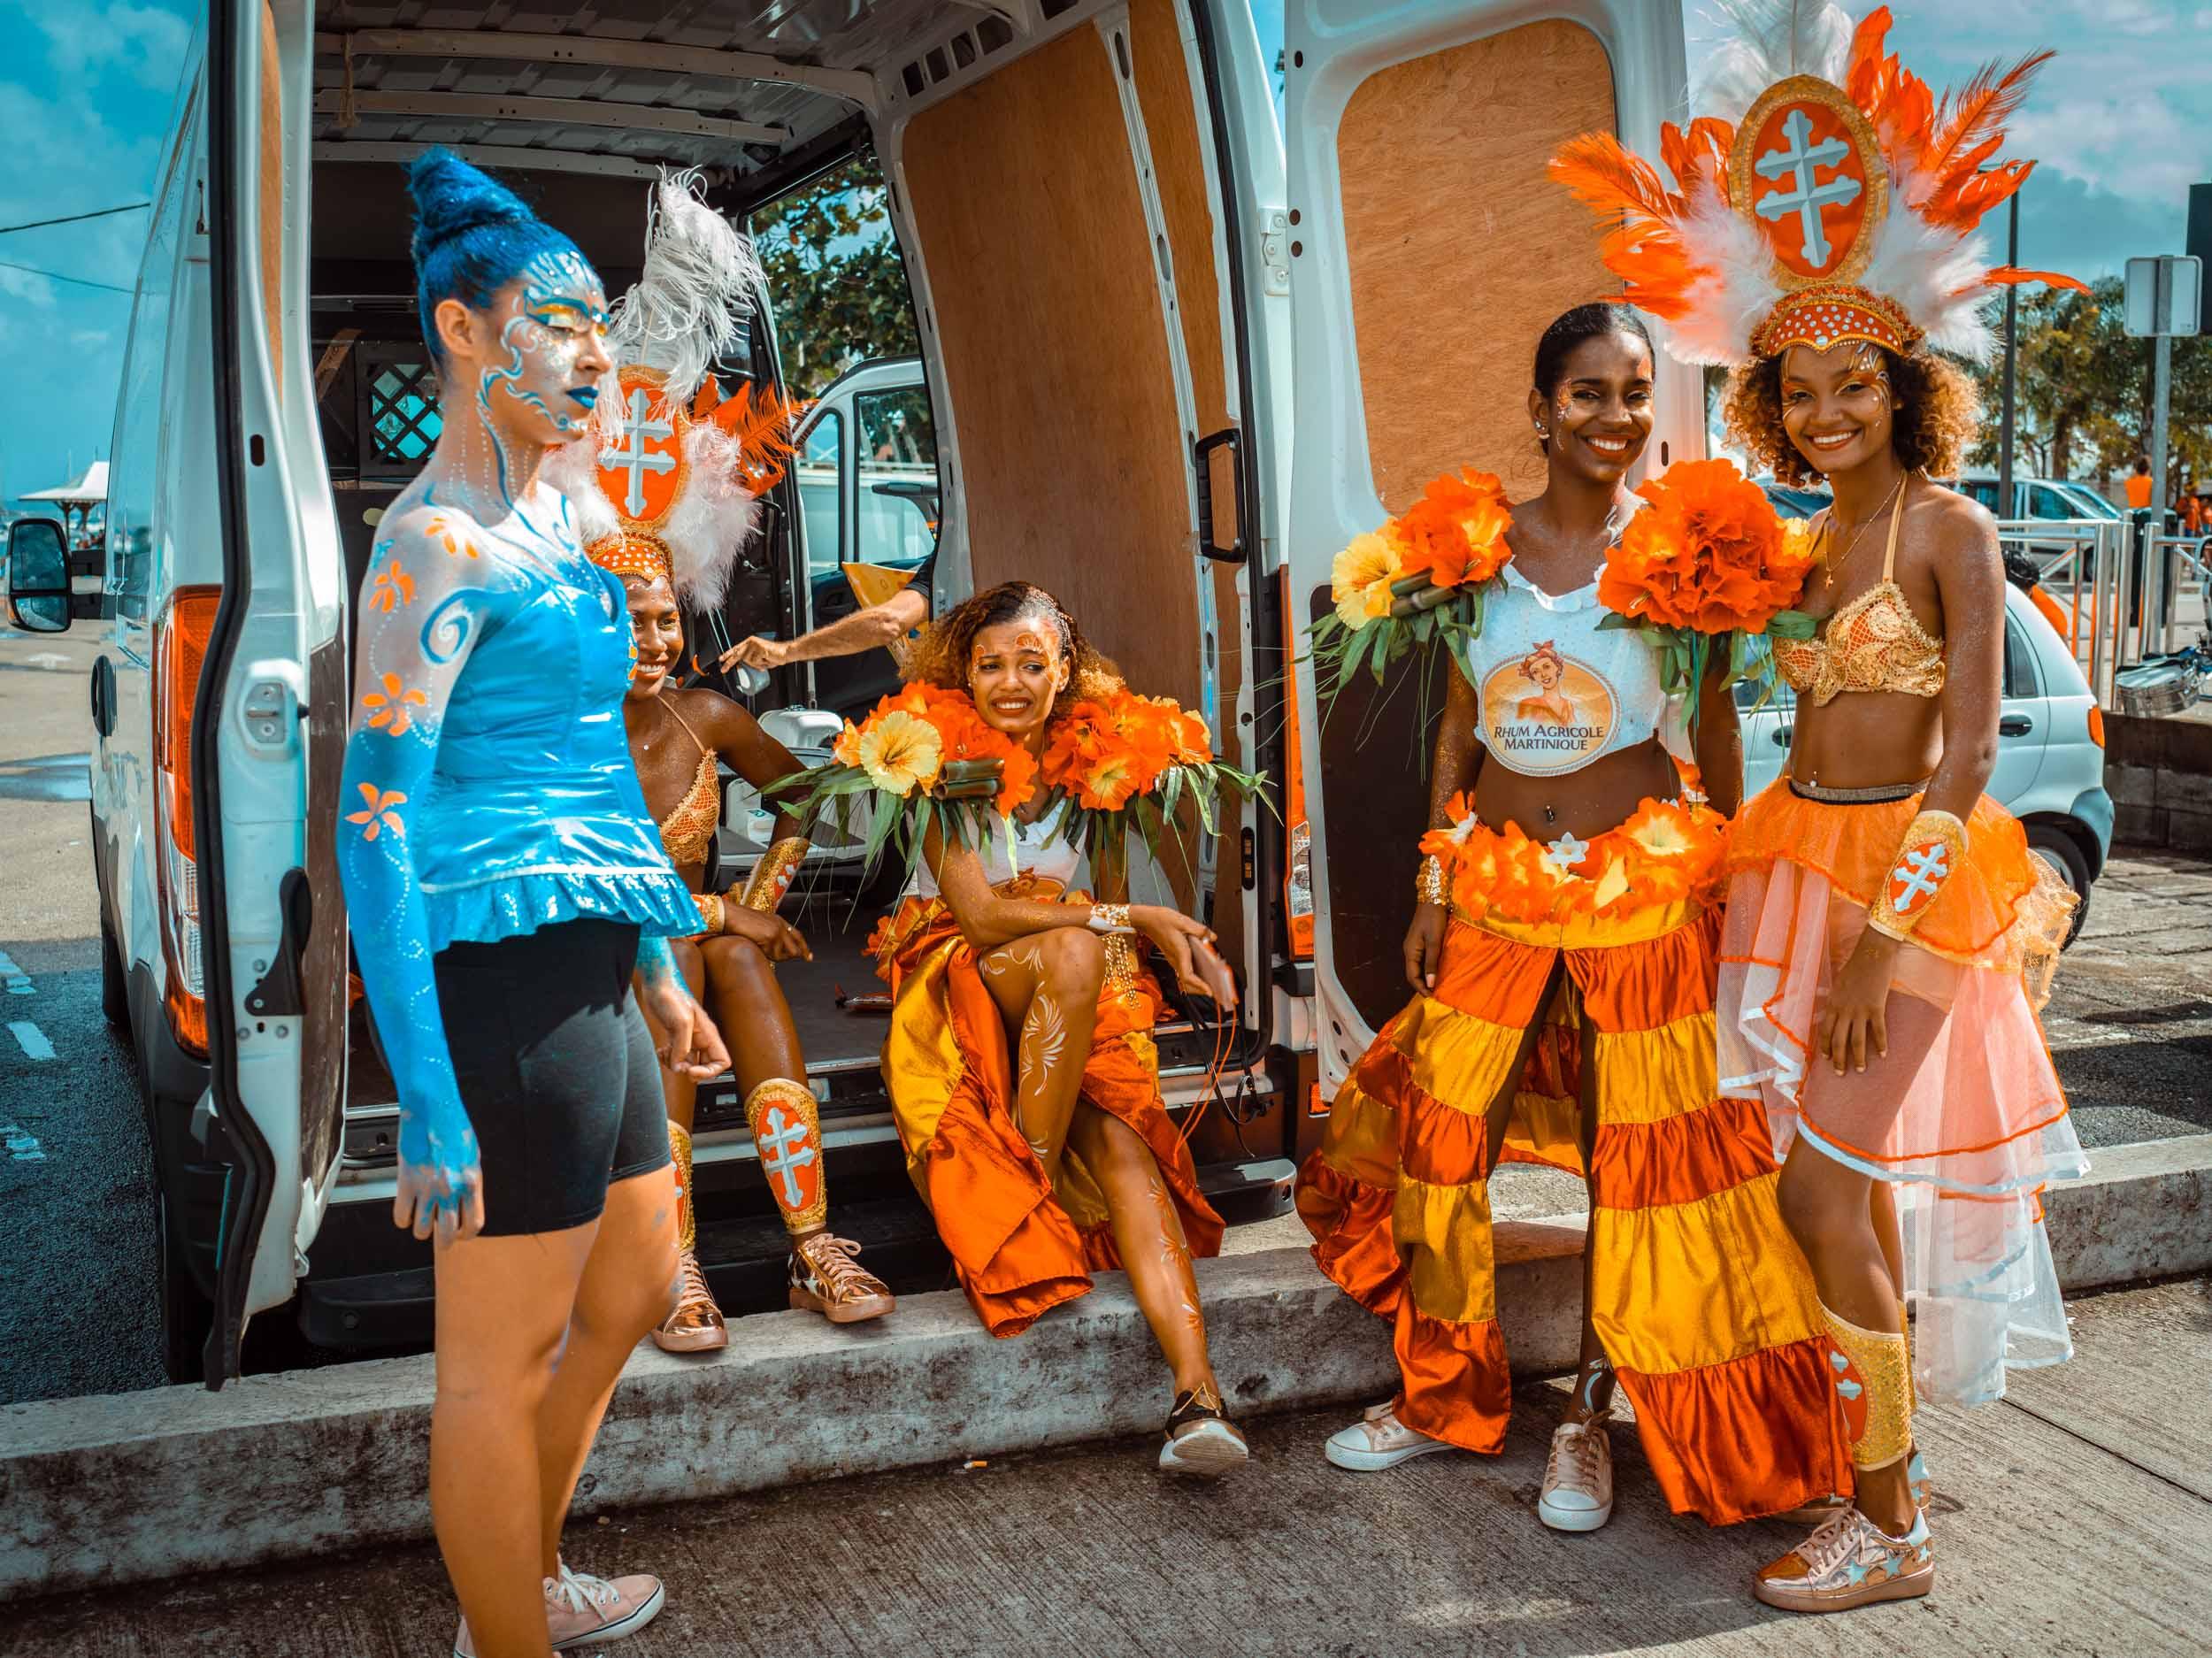 180213_SK_Martinique-1.jpg